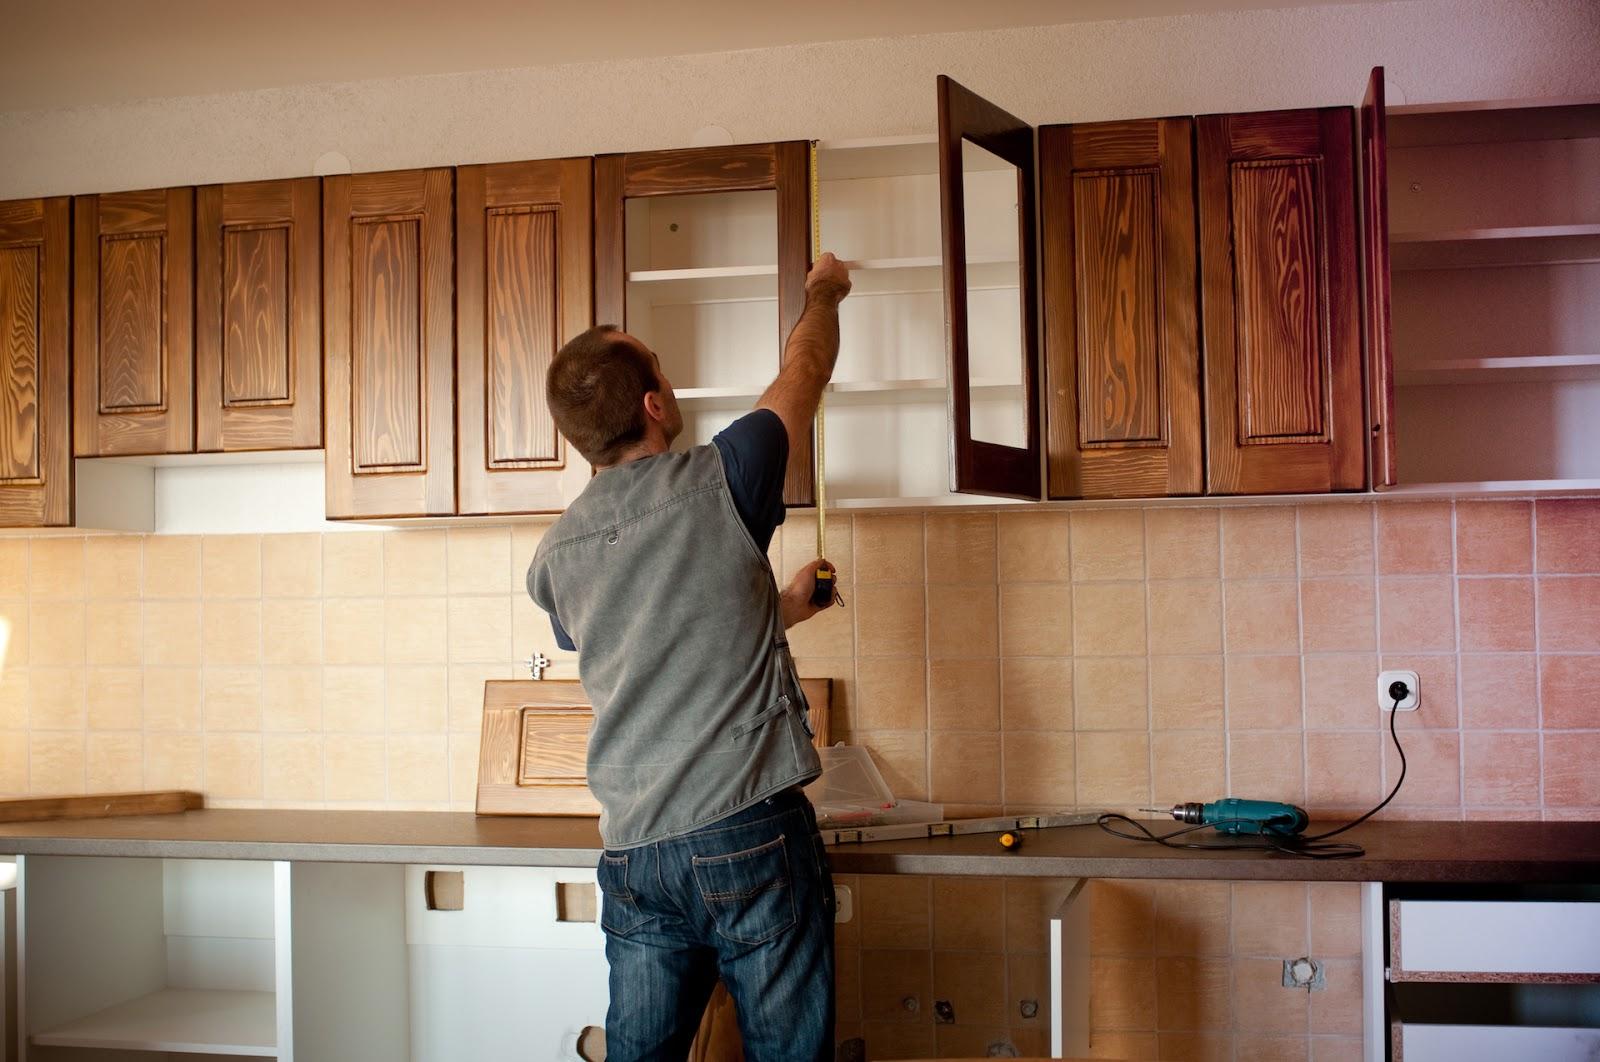 Man measuring cabinets